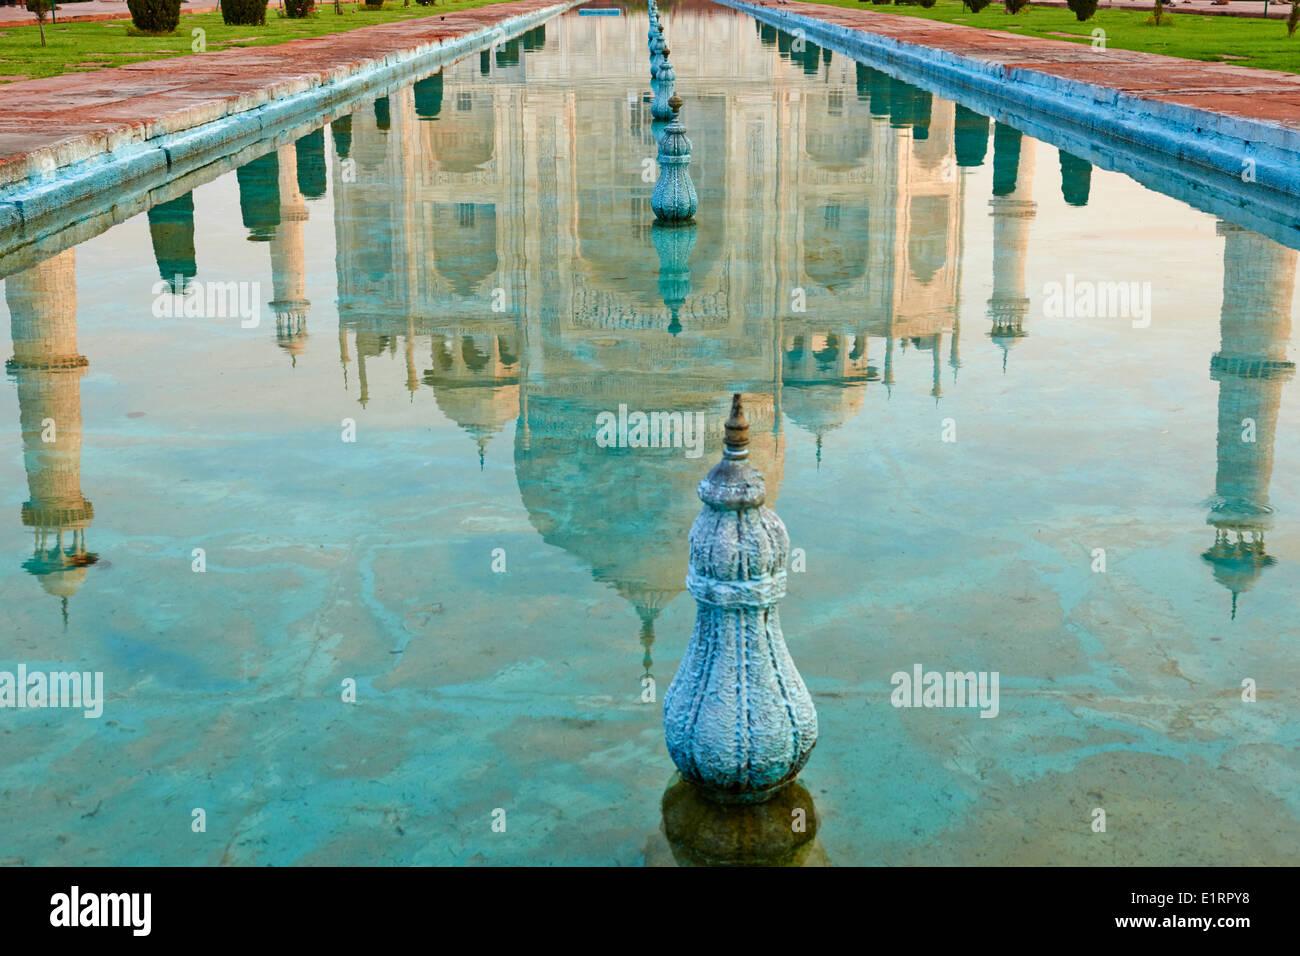 India, Uttar Pradesh state, Agra, Taj Mahal, Unesco world heritage - Stock Image